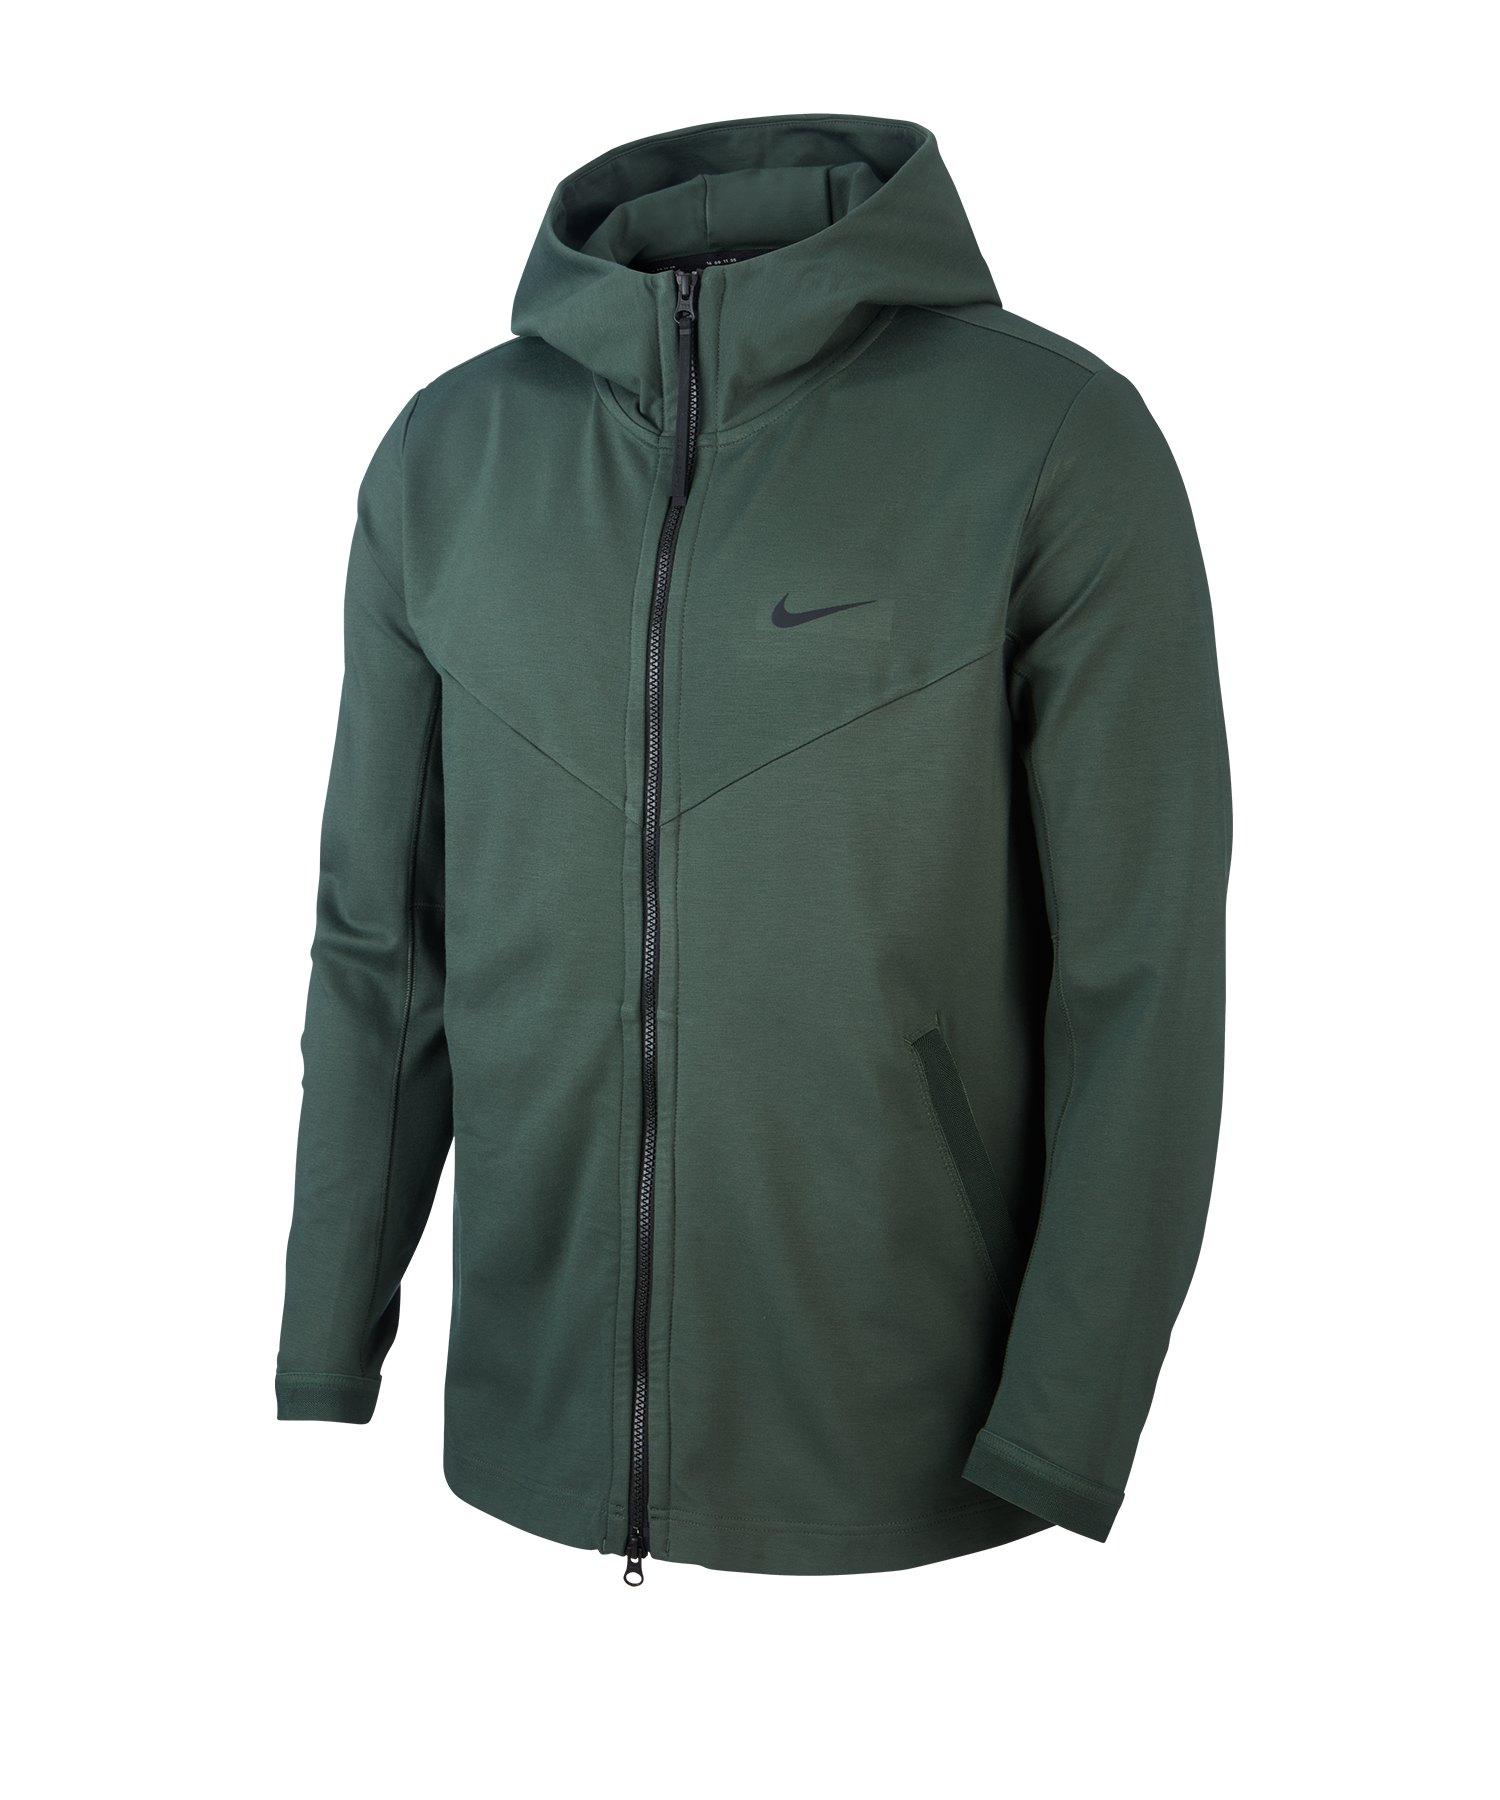 Nike F.C. Jacket Jacke Herren Kurzmantel Übergangsjacke Grün